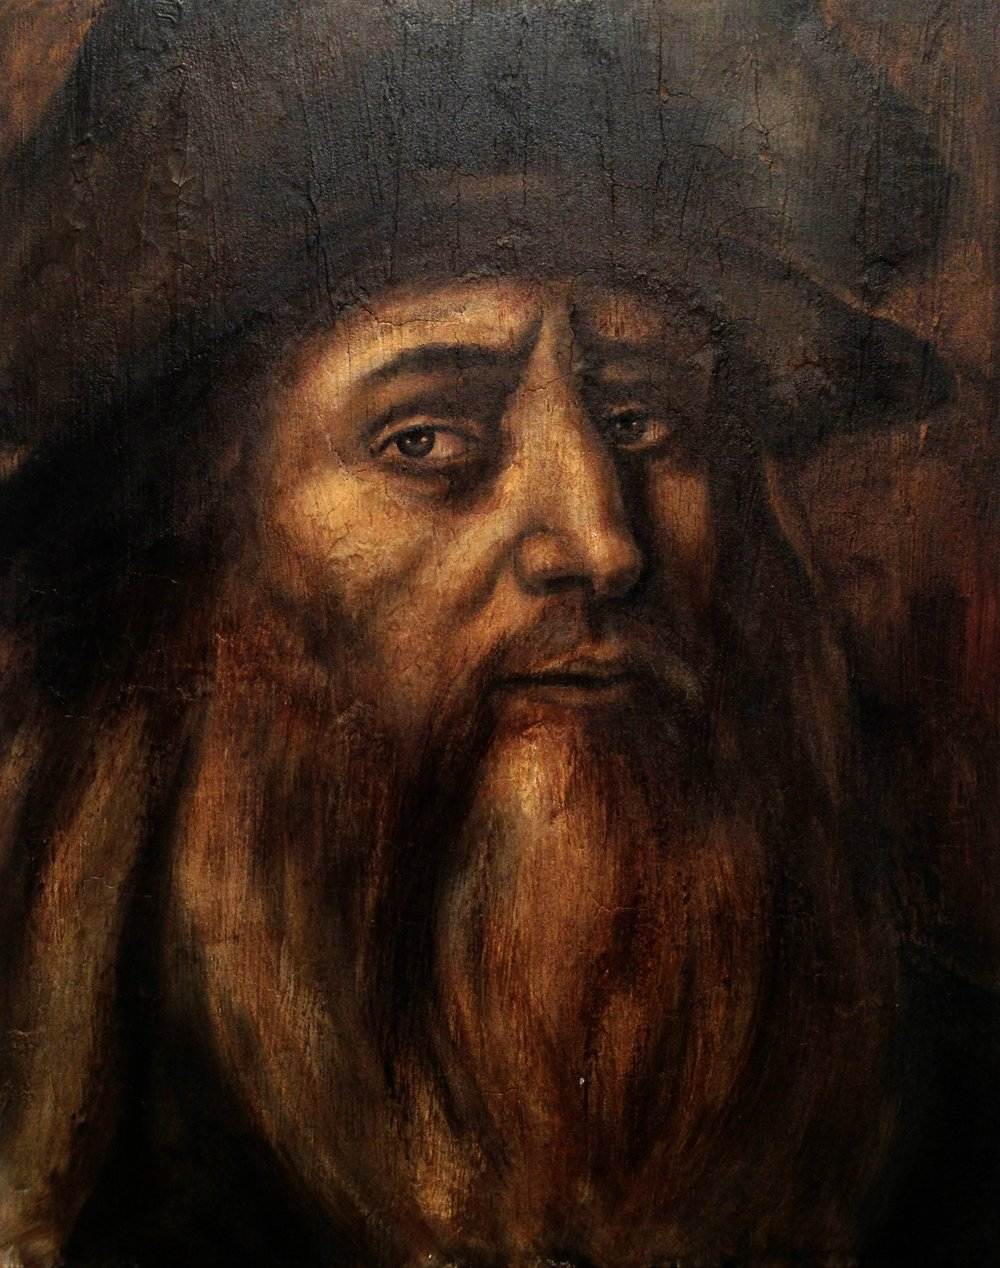 Da Vinci, 2016   Acrylic & texture medium on canvas